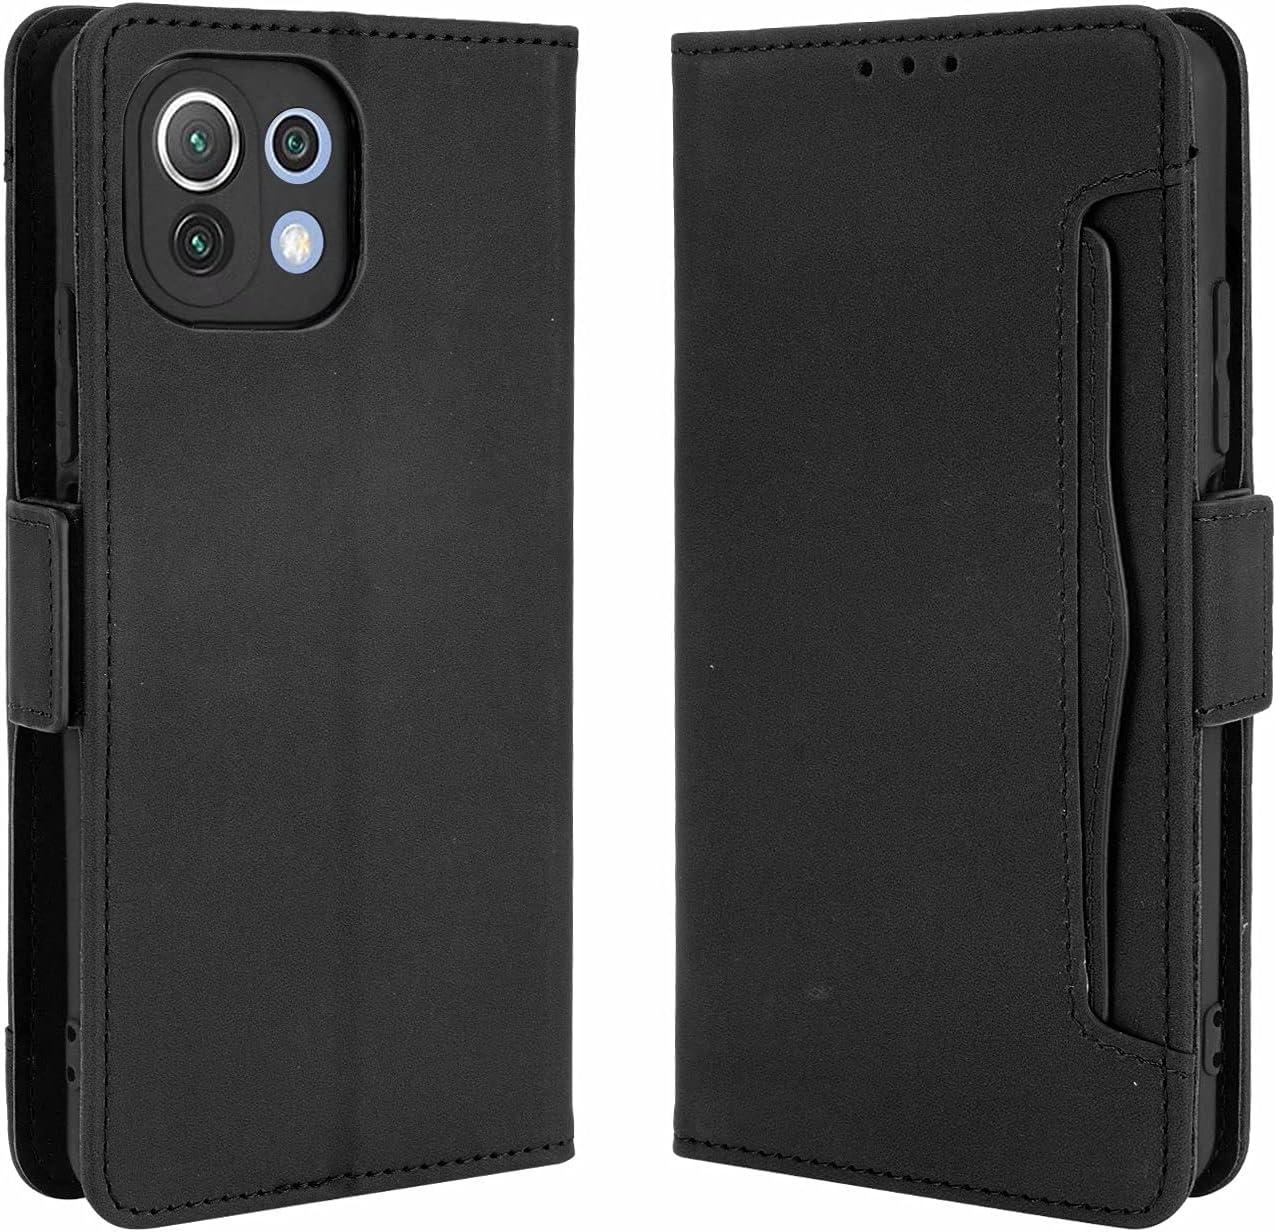 SOUFU Funda para Xiaomi Mi 11 Lite 5G/4G Funda,PU Cuero Flip Fundas Móvil de Tapa Libro con Effetto anticollisione e Anti para Xiaomi Mi 11 Lite 5G/4G Funda-Negro